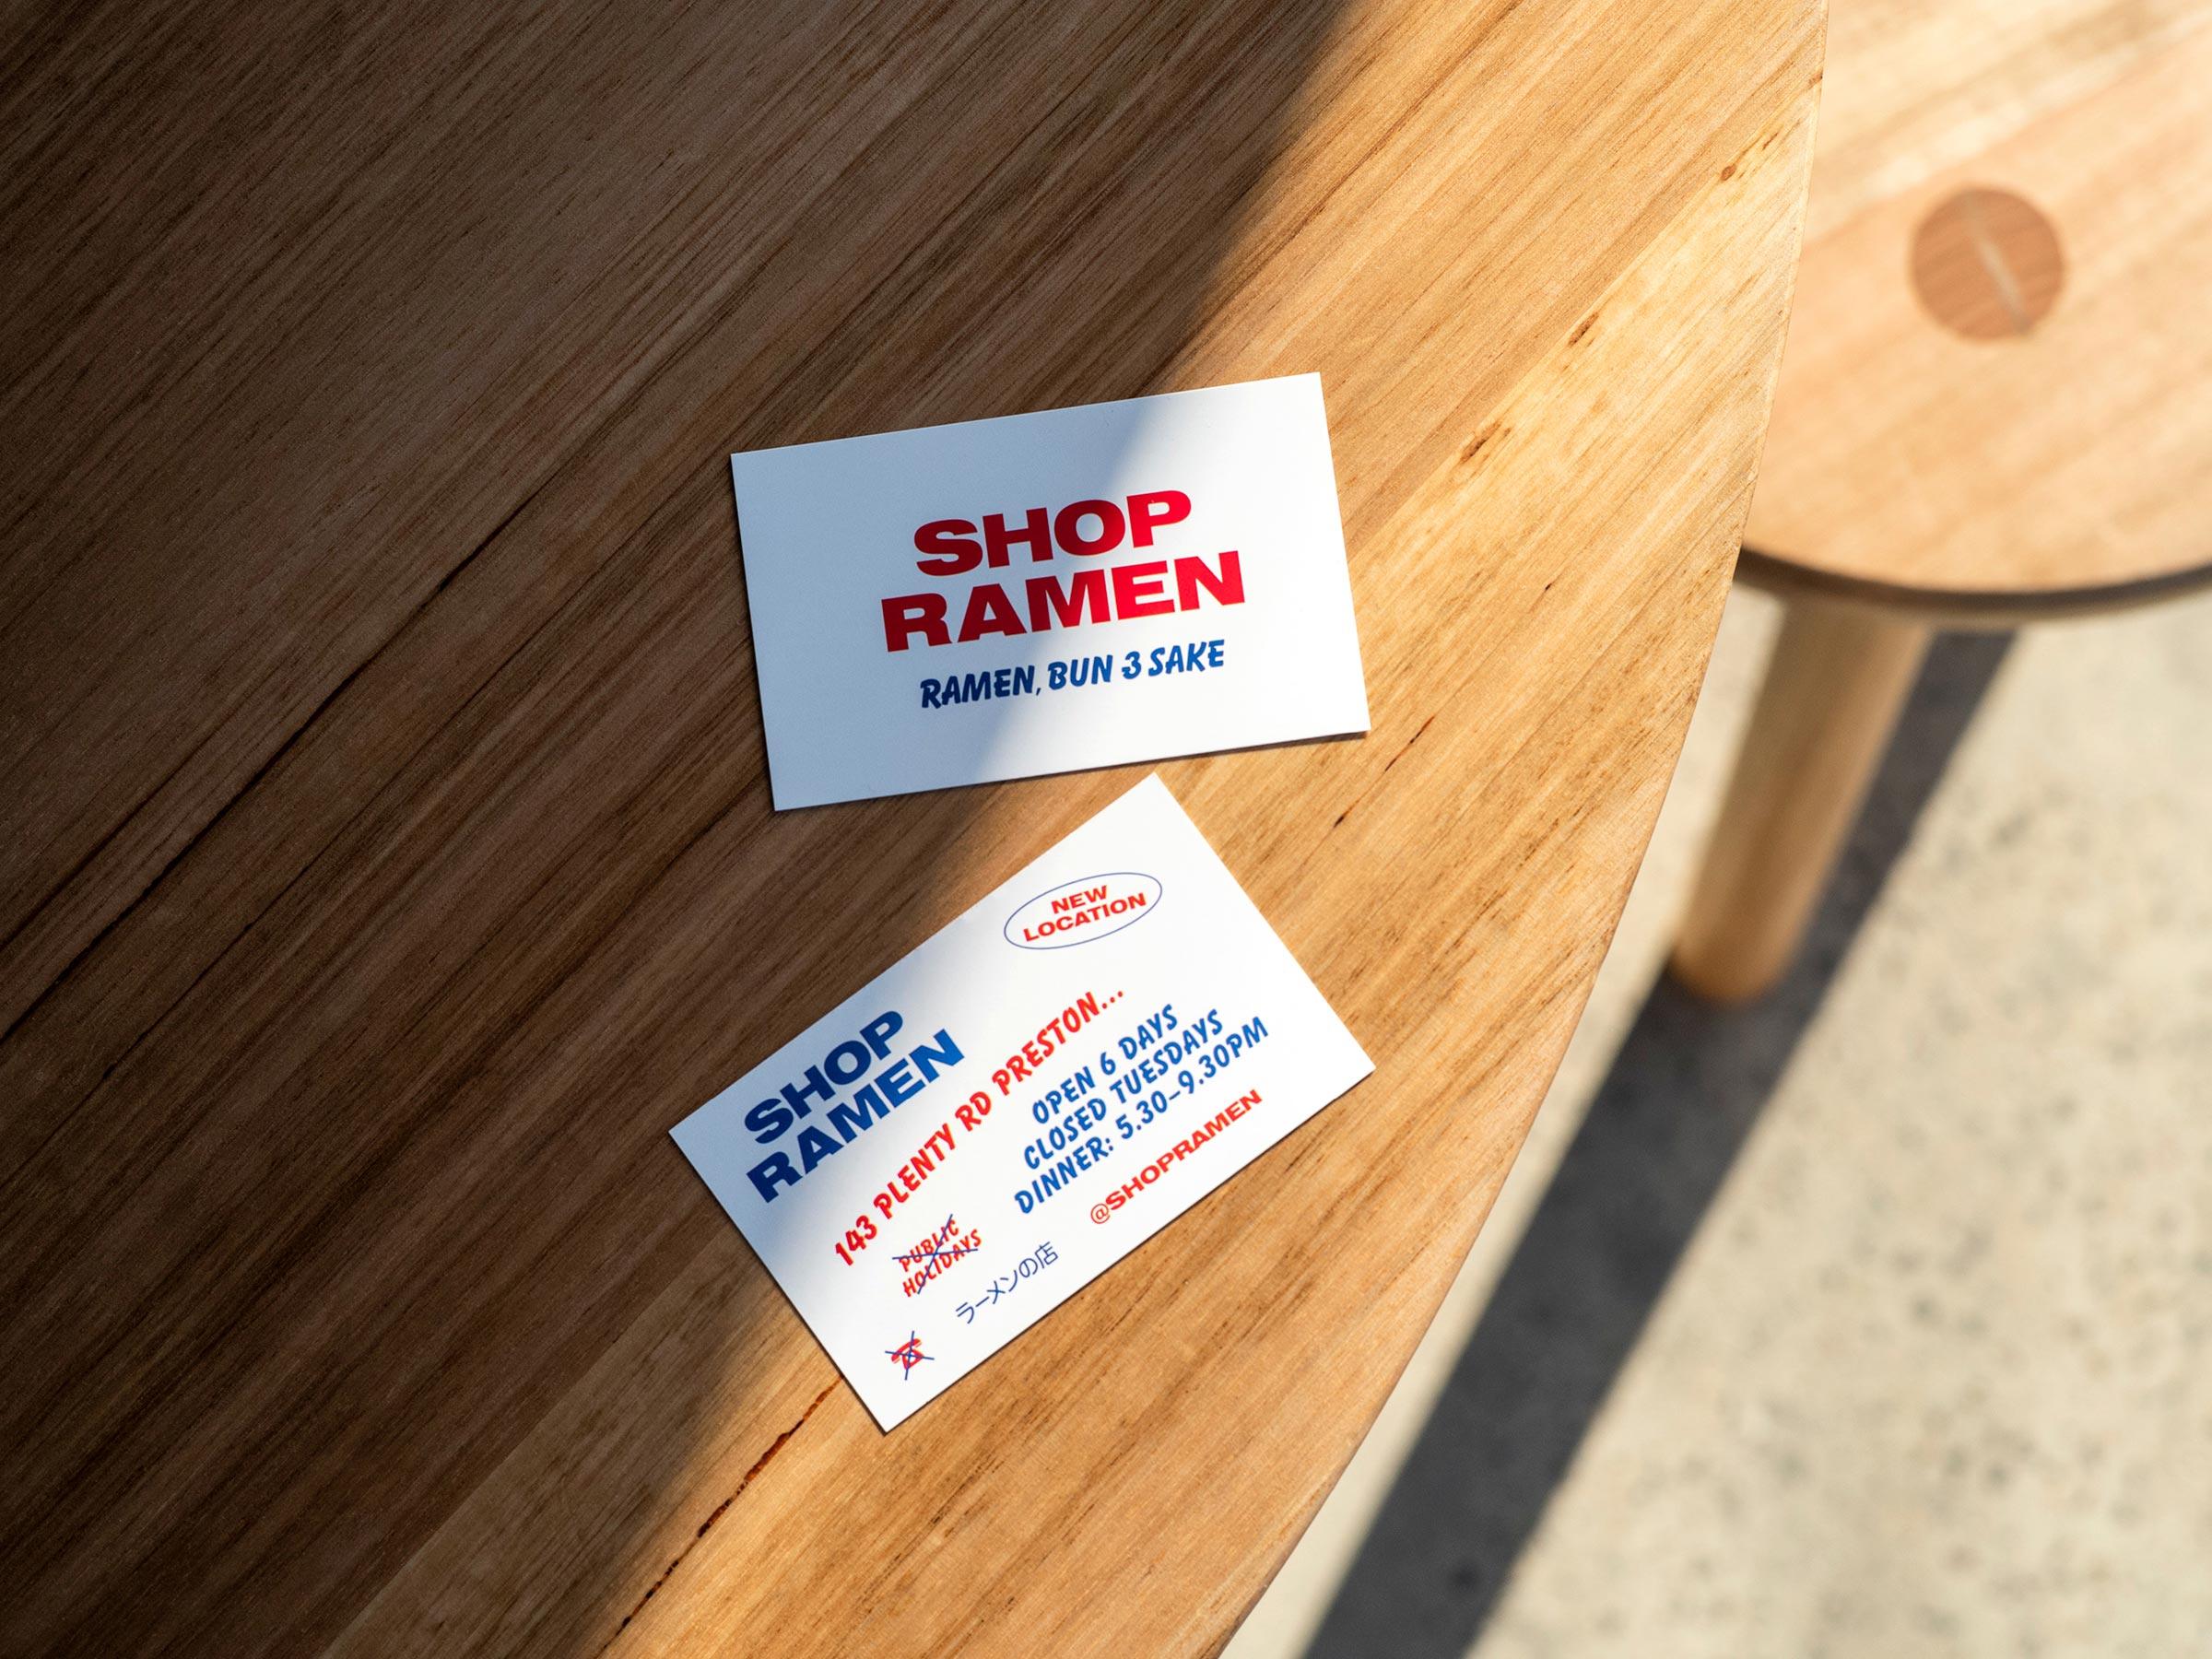 Shop Ramen